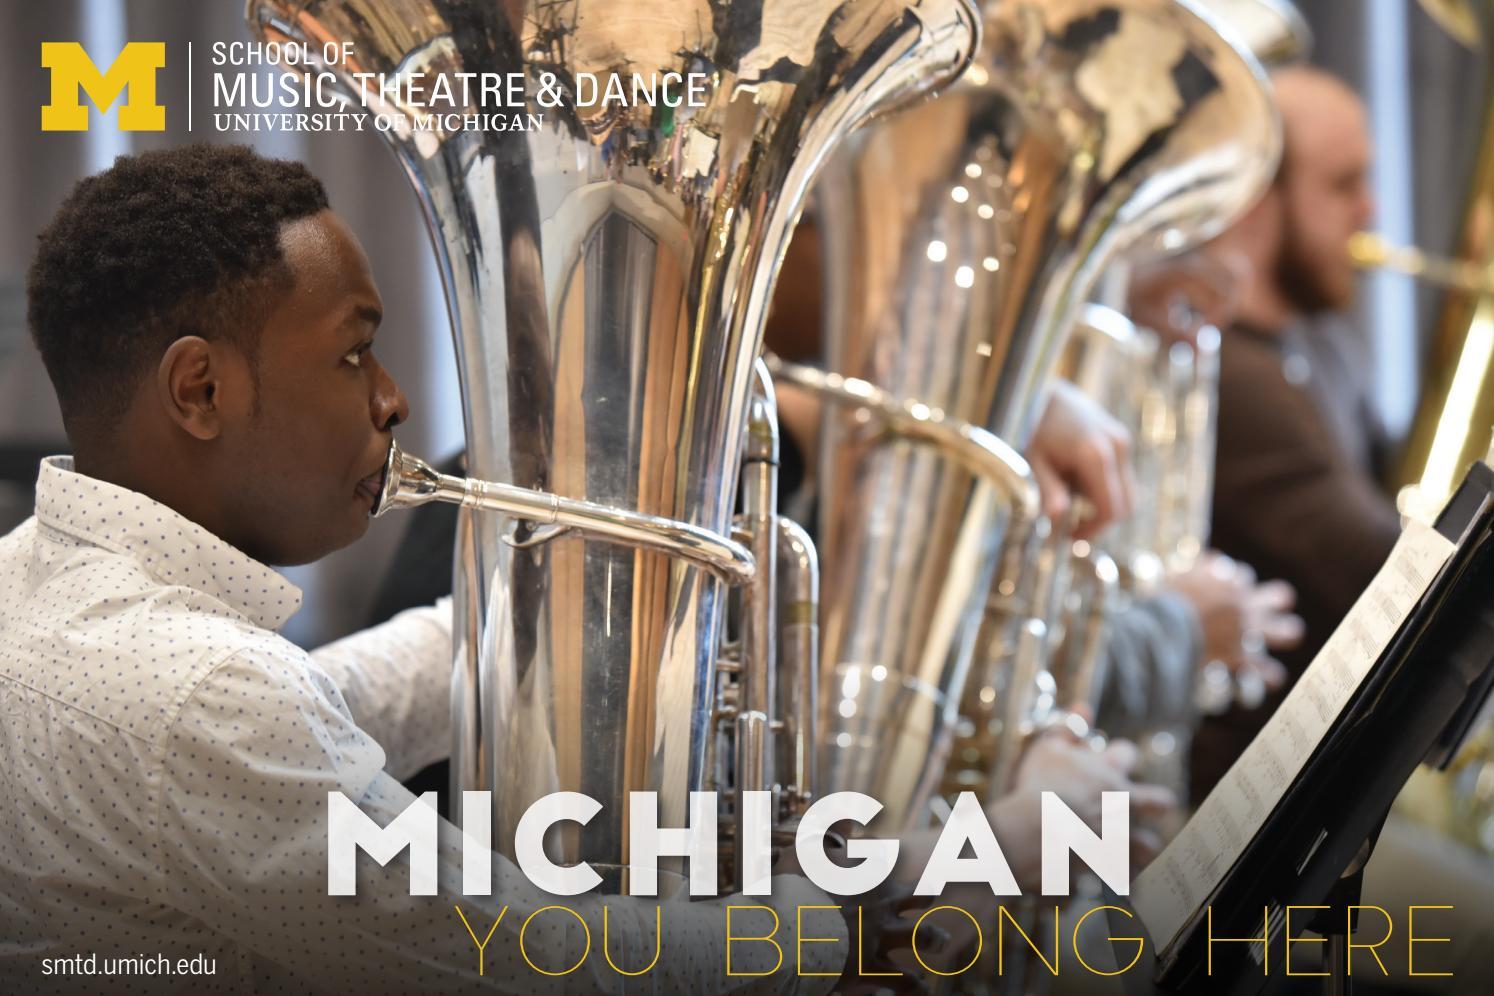 2018 SMTD Admissions Viewbook by University of Michigan